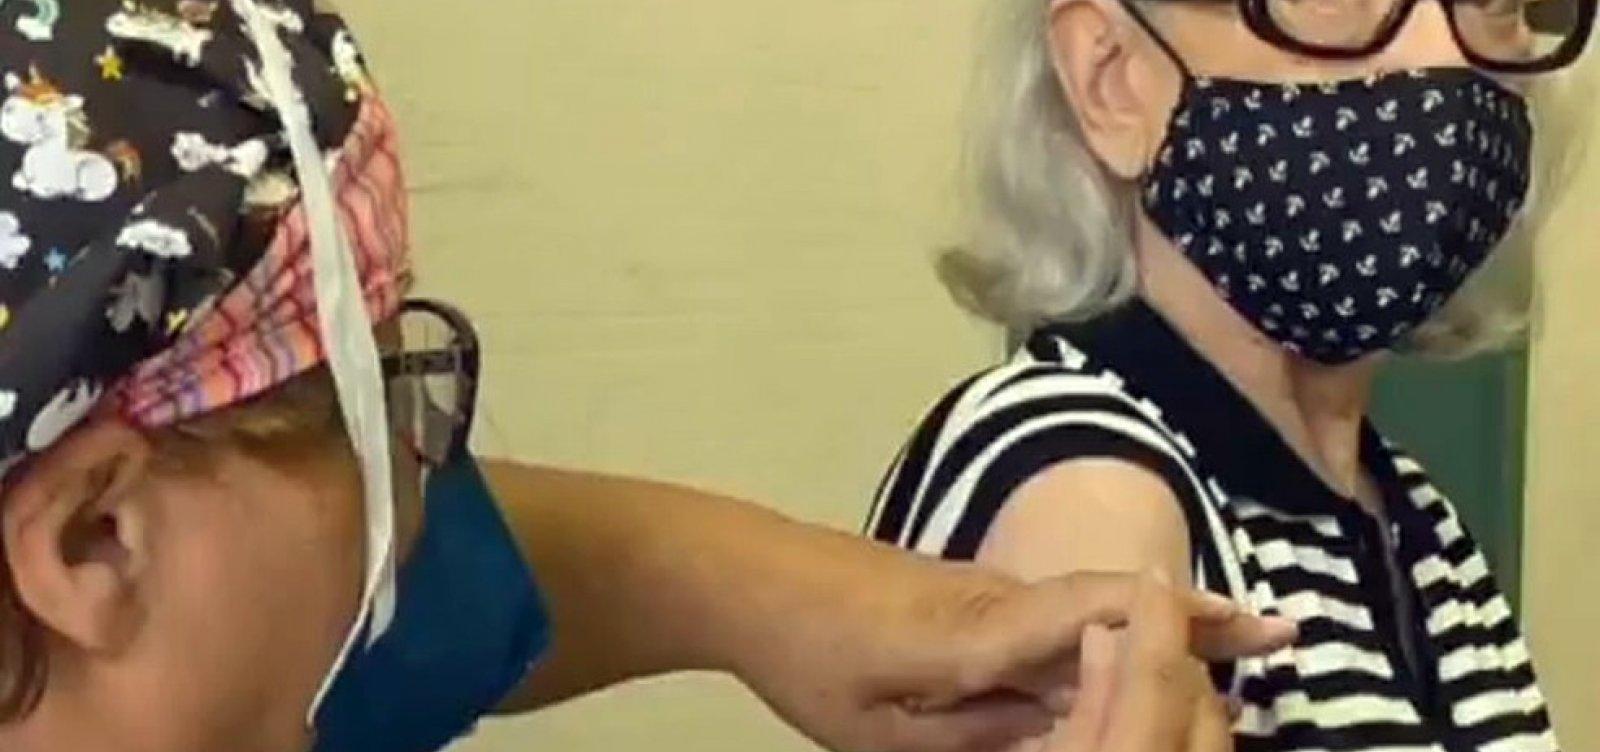 Fernanda Montenegro é vacinada contra a Covid-19 no Rio de Janeiro